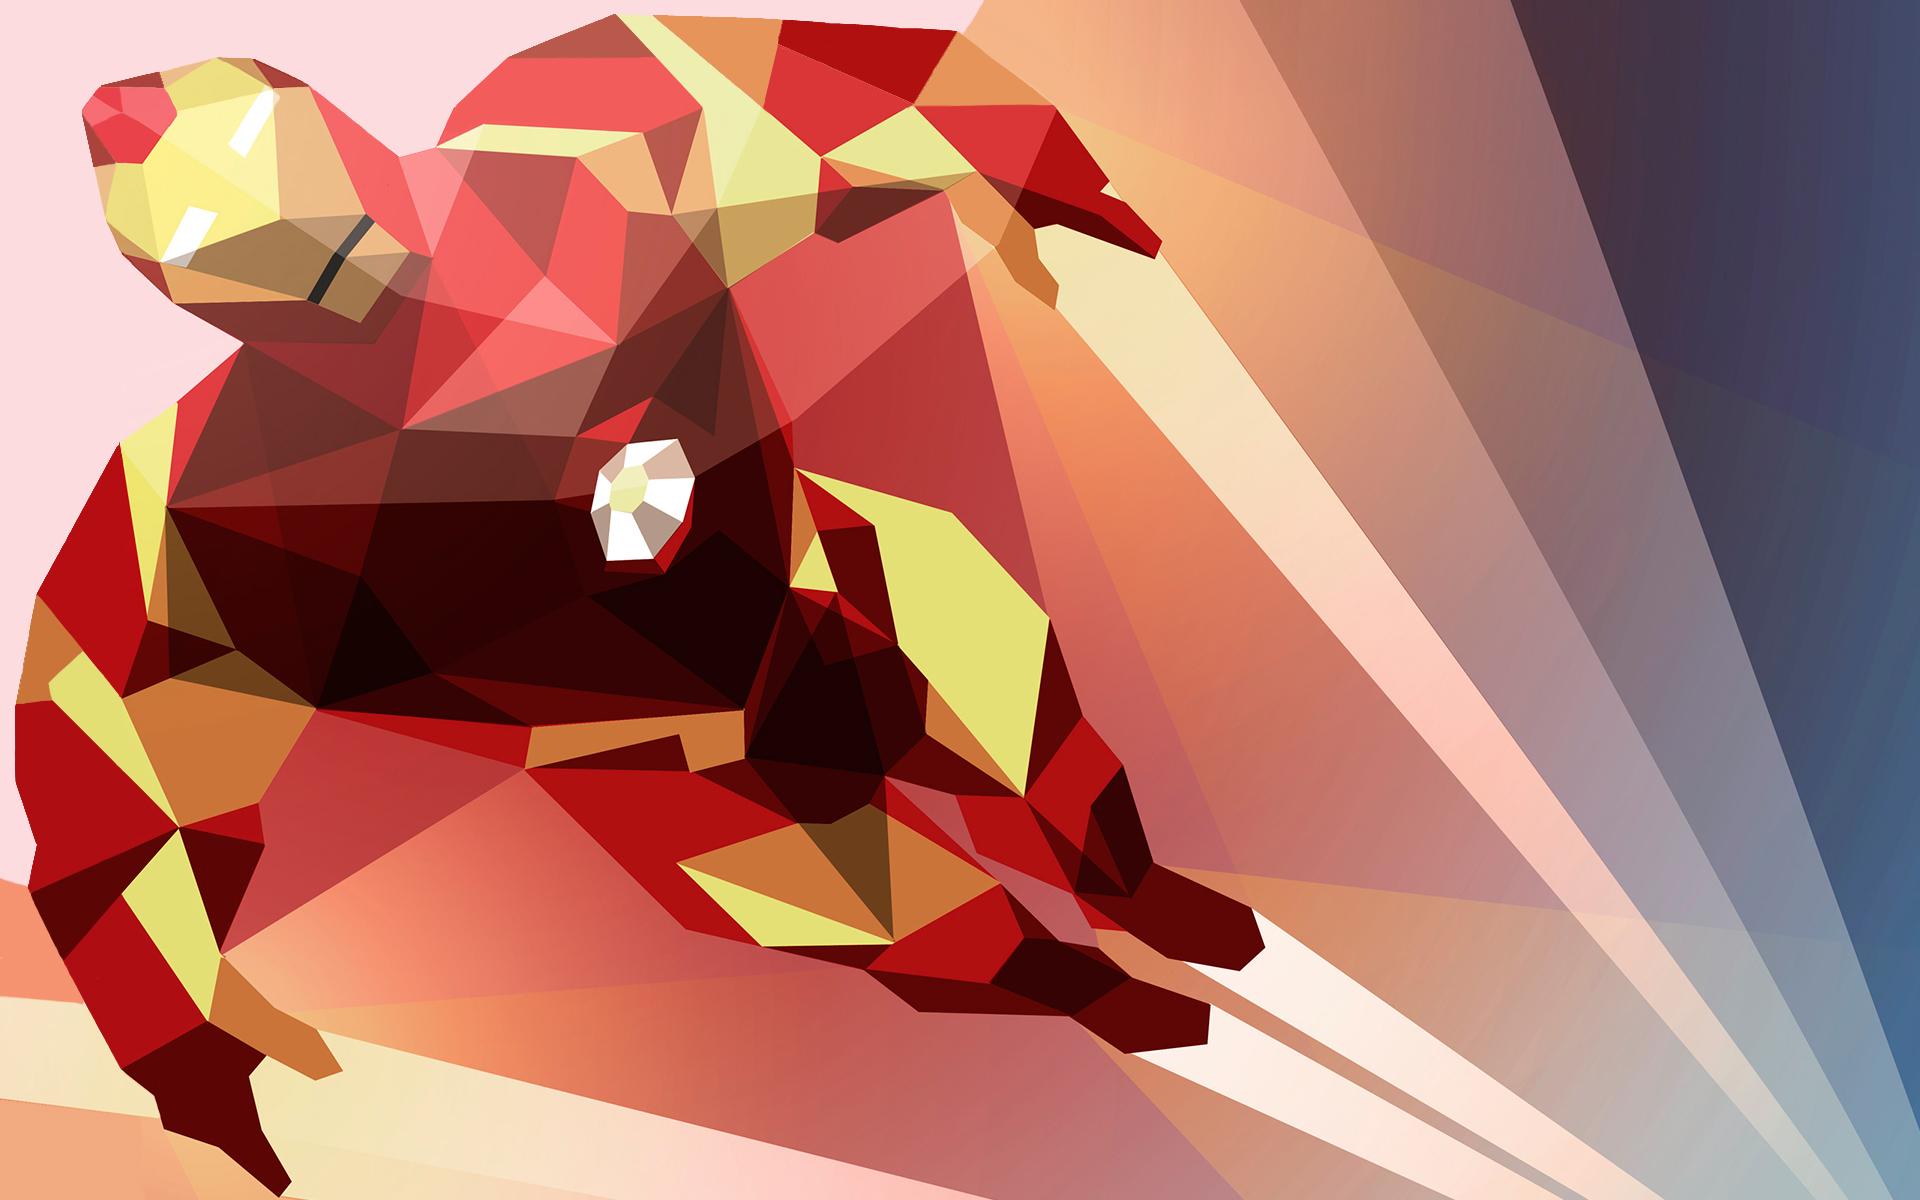 Iron man full hd fond d 39 cran and arri re plan 1920x1200 for Plan d iron man